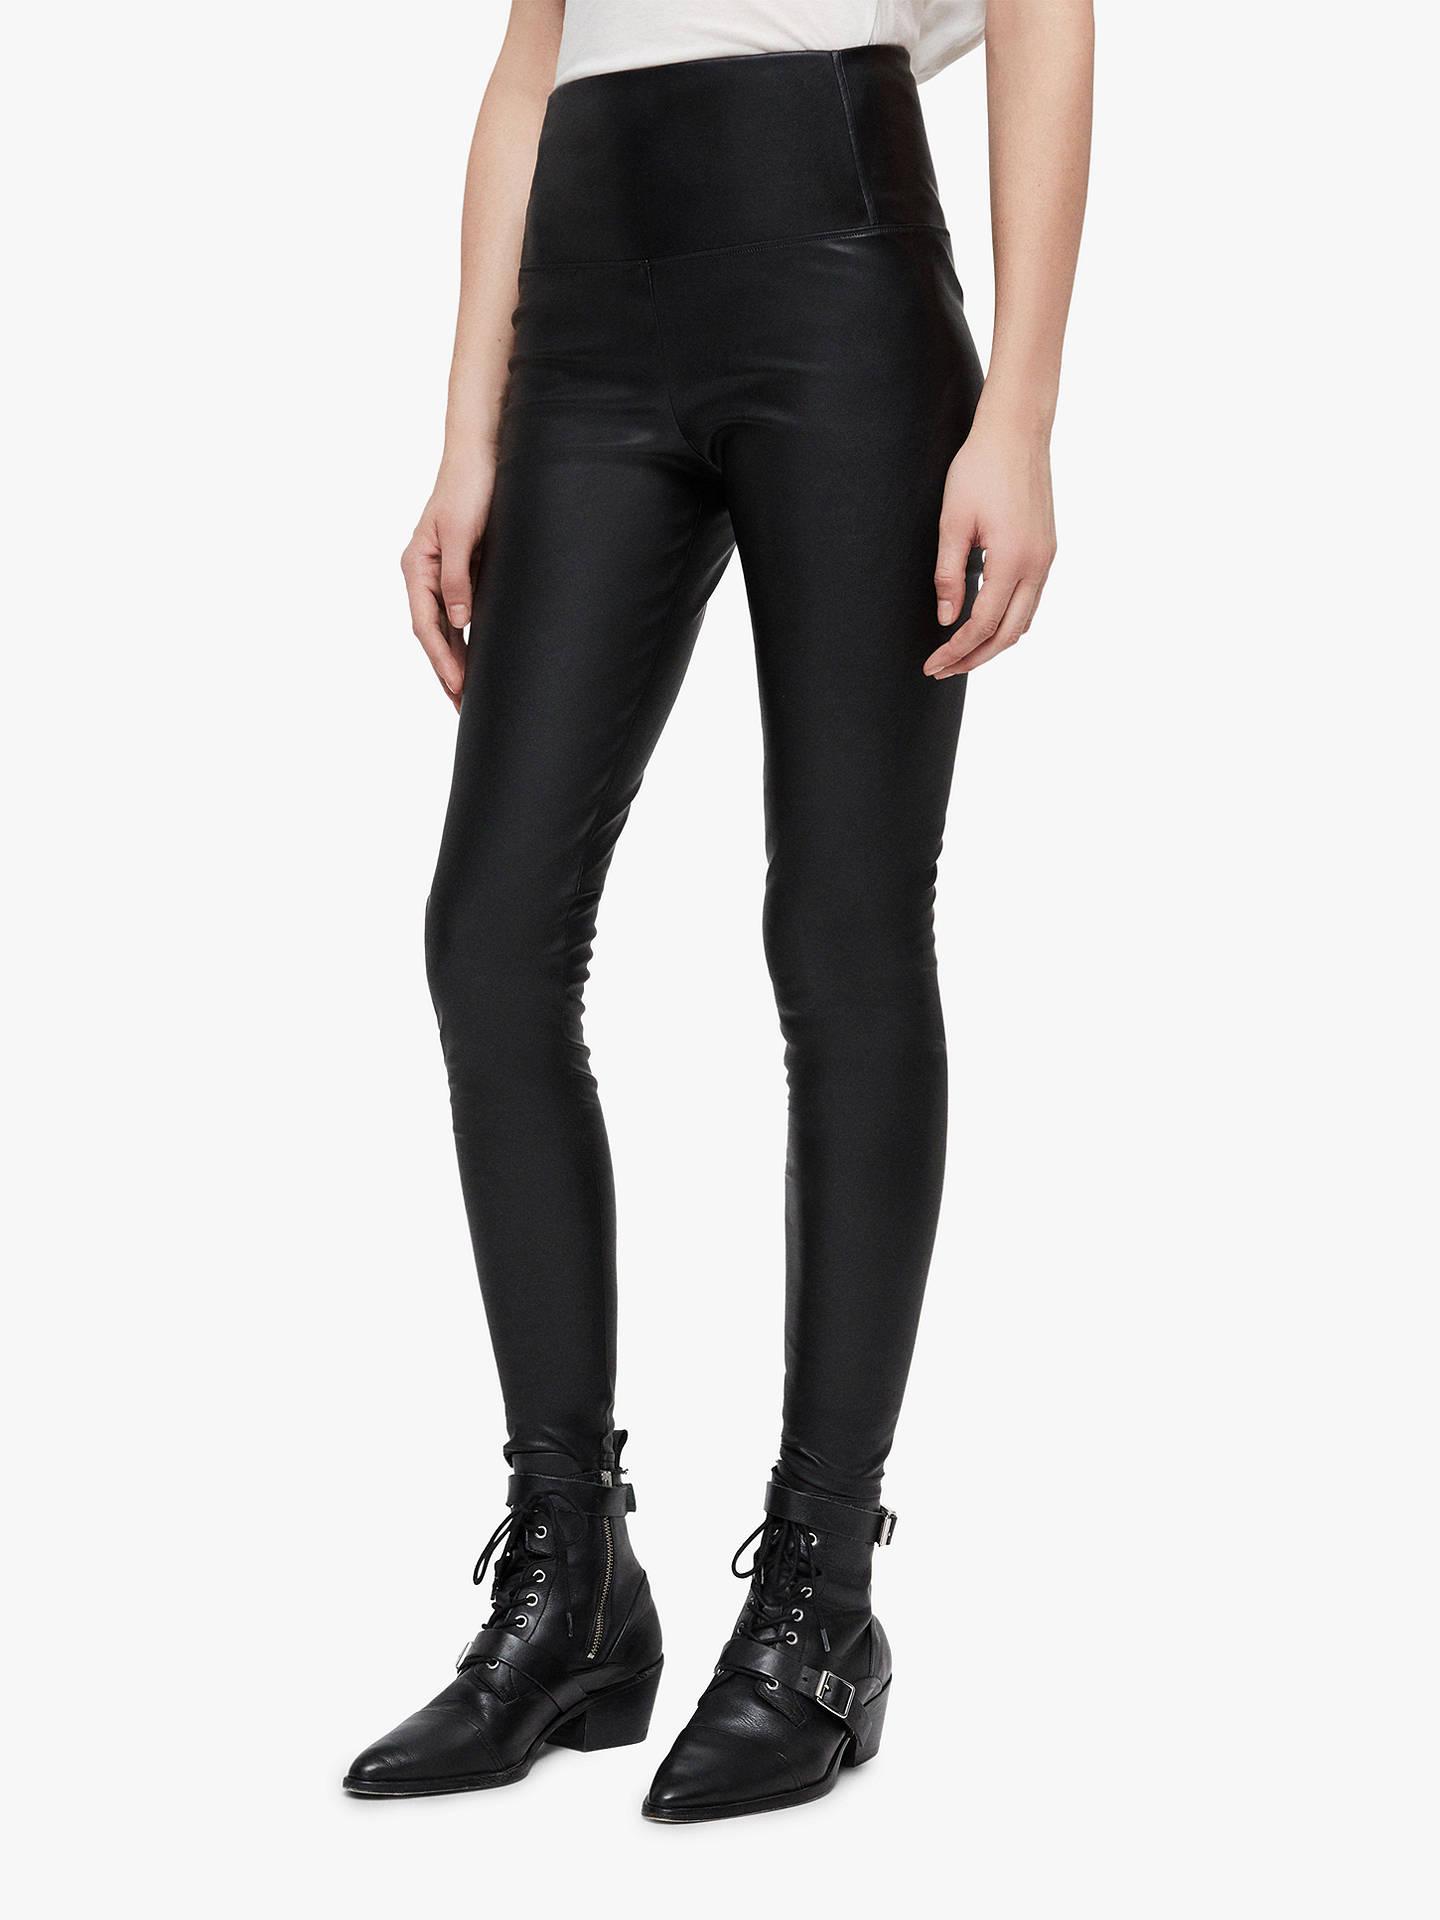 8366a1d0b965 Buy AllSaints Cora Leggings